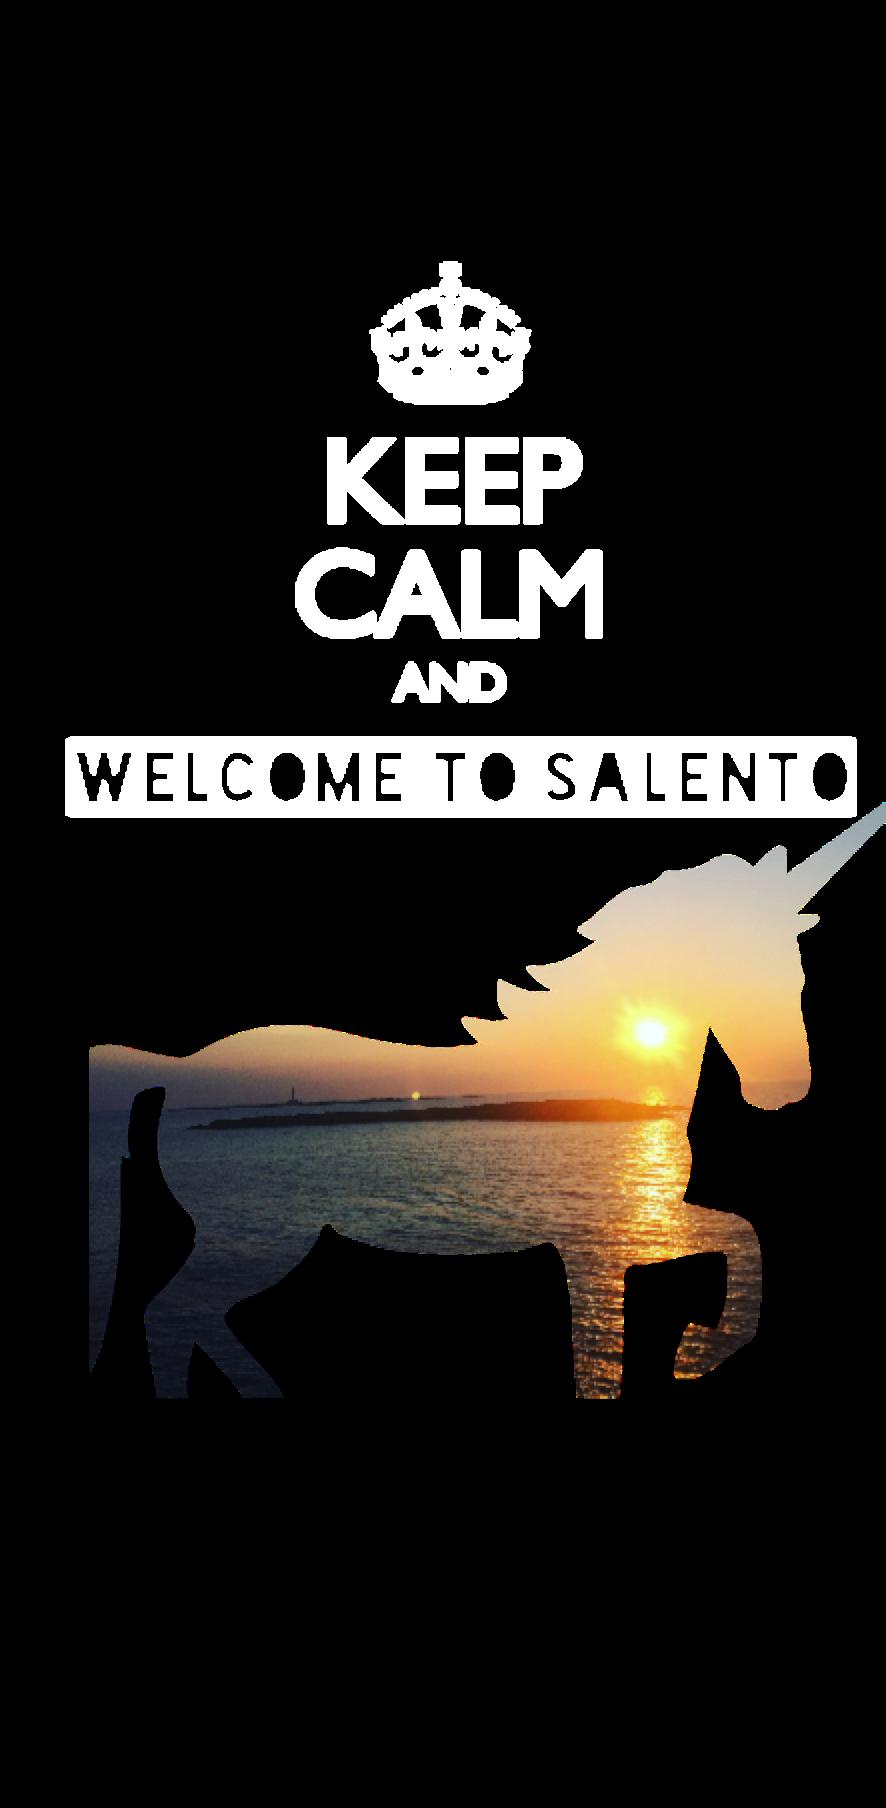 Creazioni Su Salentomania' it Creata Darobertafox1Tante Teeser n0X8wOPk